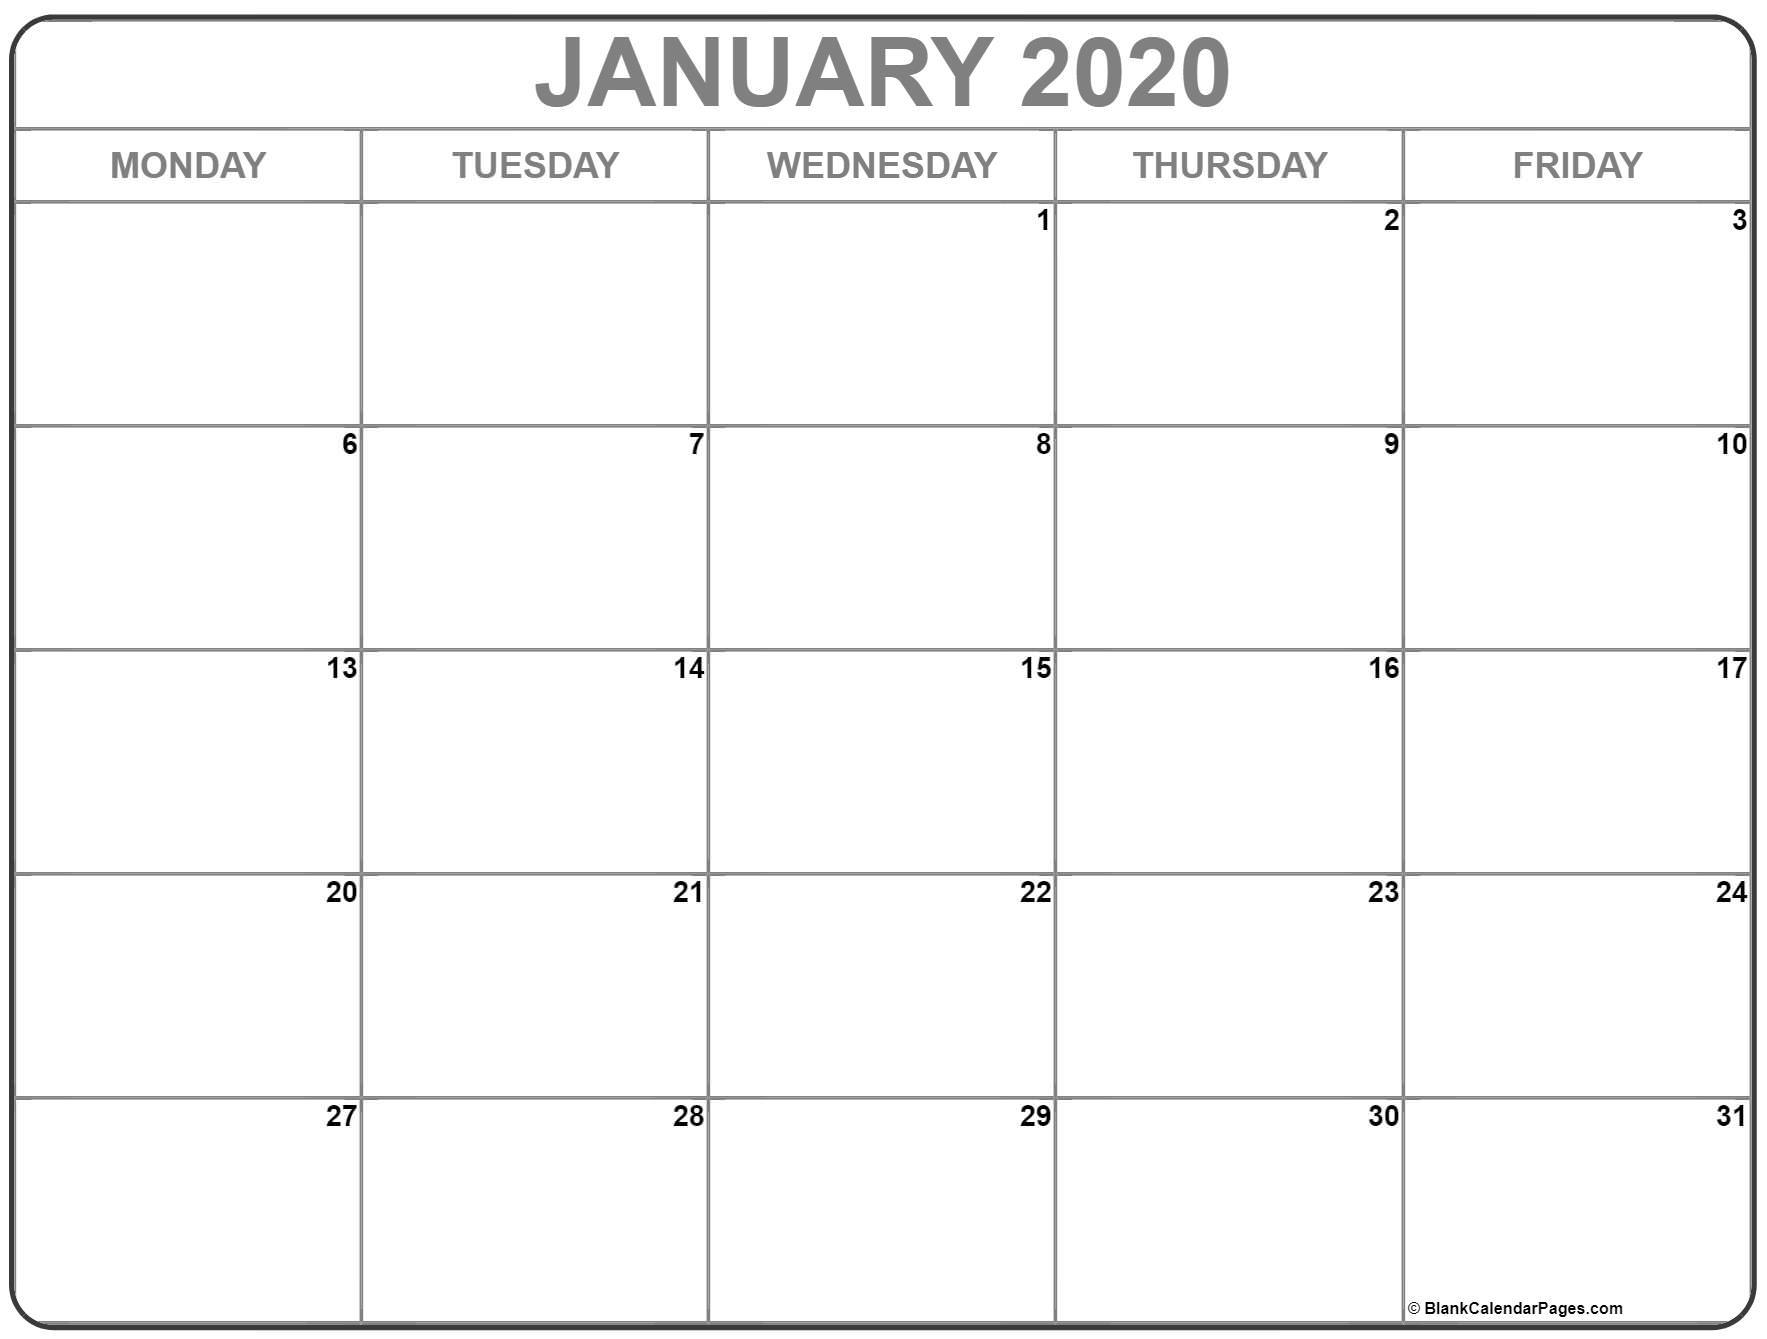 January 2020 Monday Calendar | Monday To Sunday